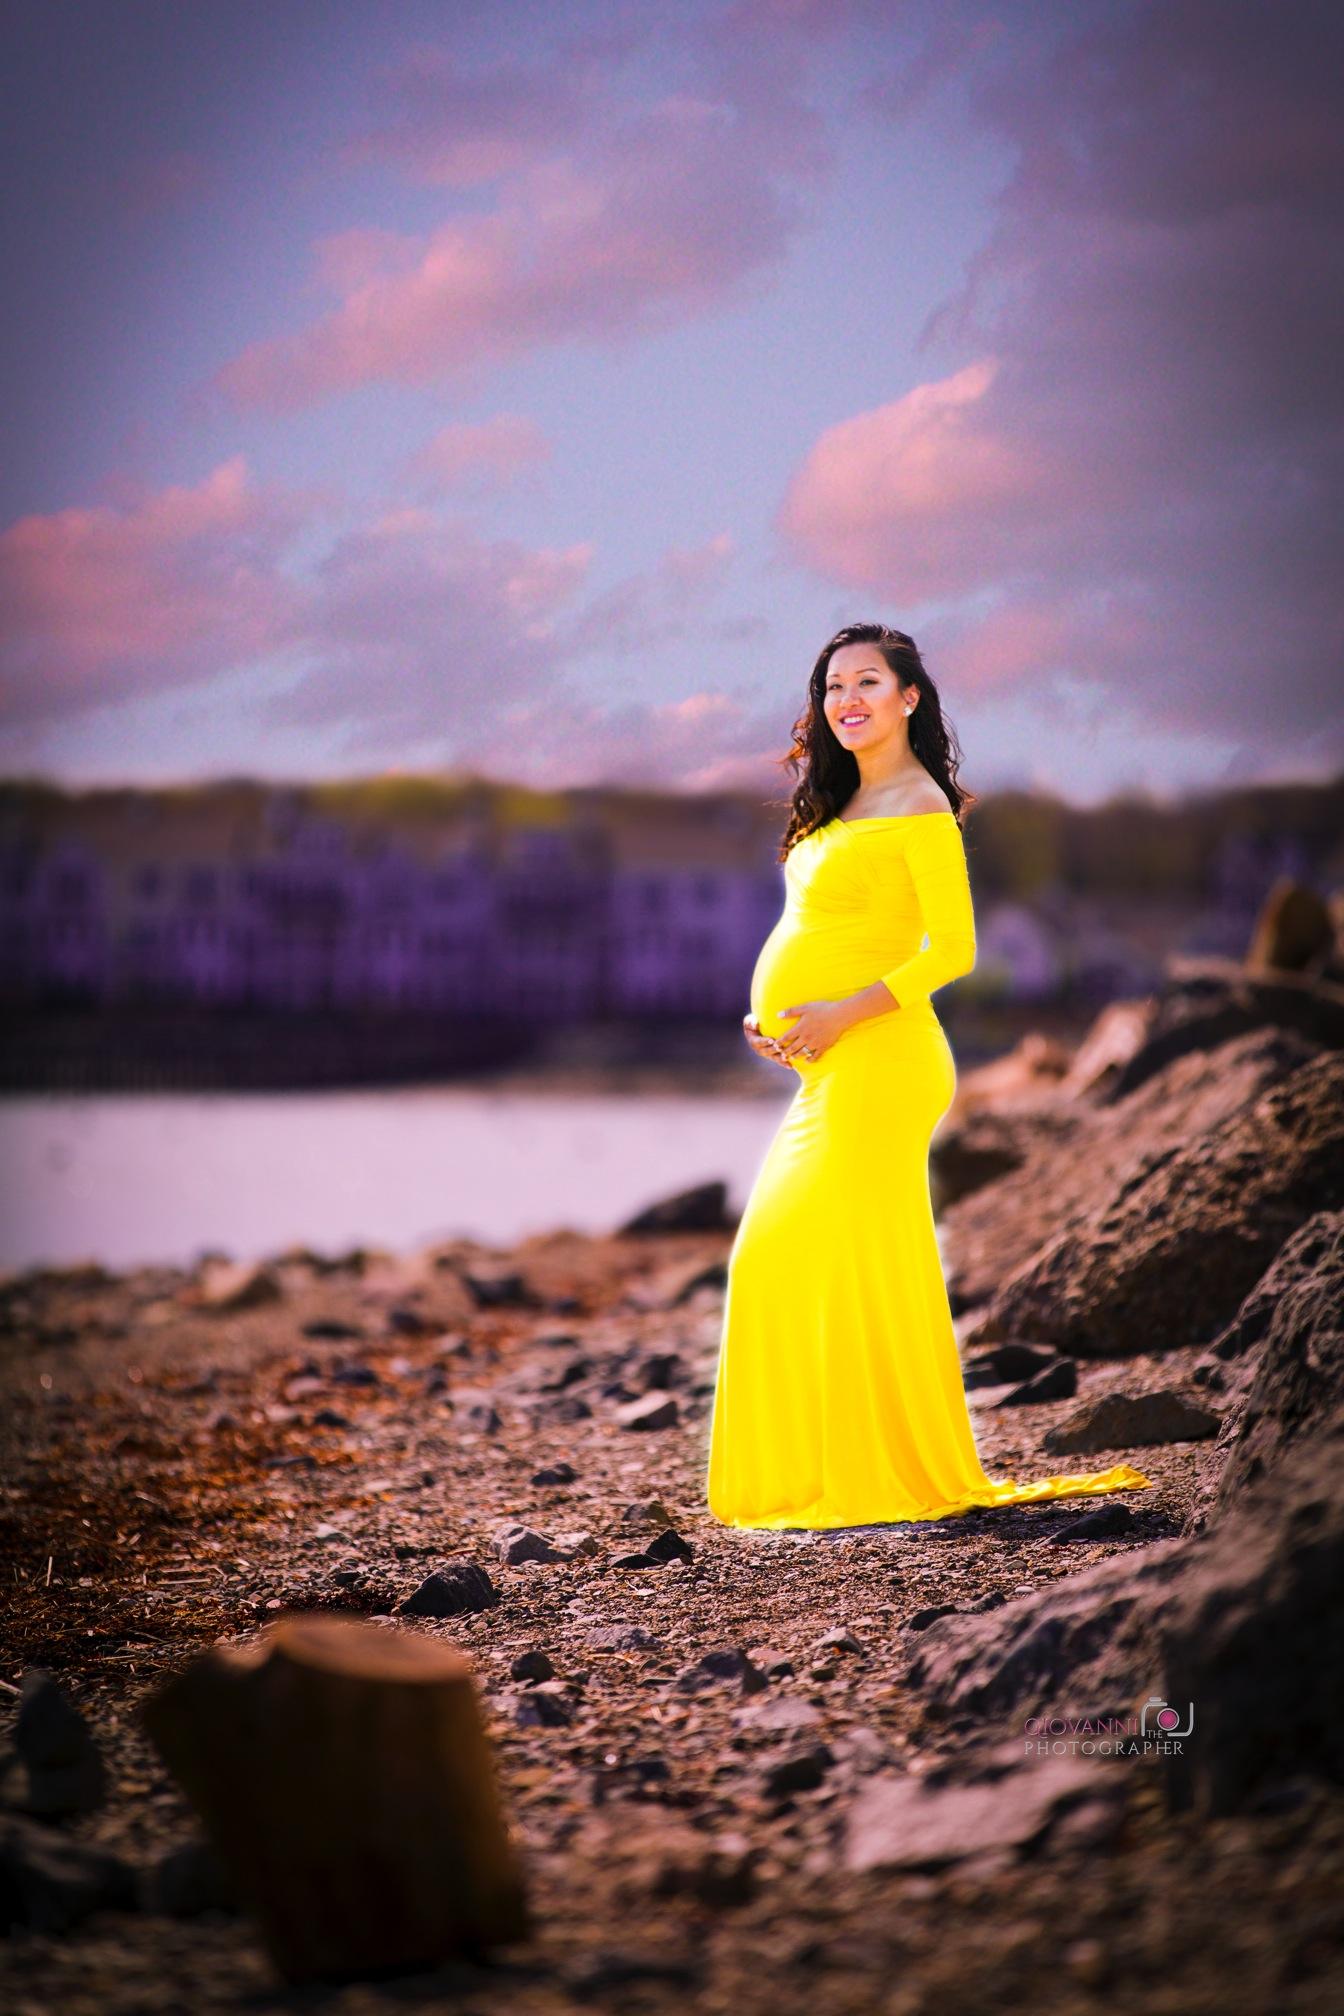 314A1455-Giovanni The Photographer Boston Maternity Newborn Photography 35Percent.jpg